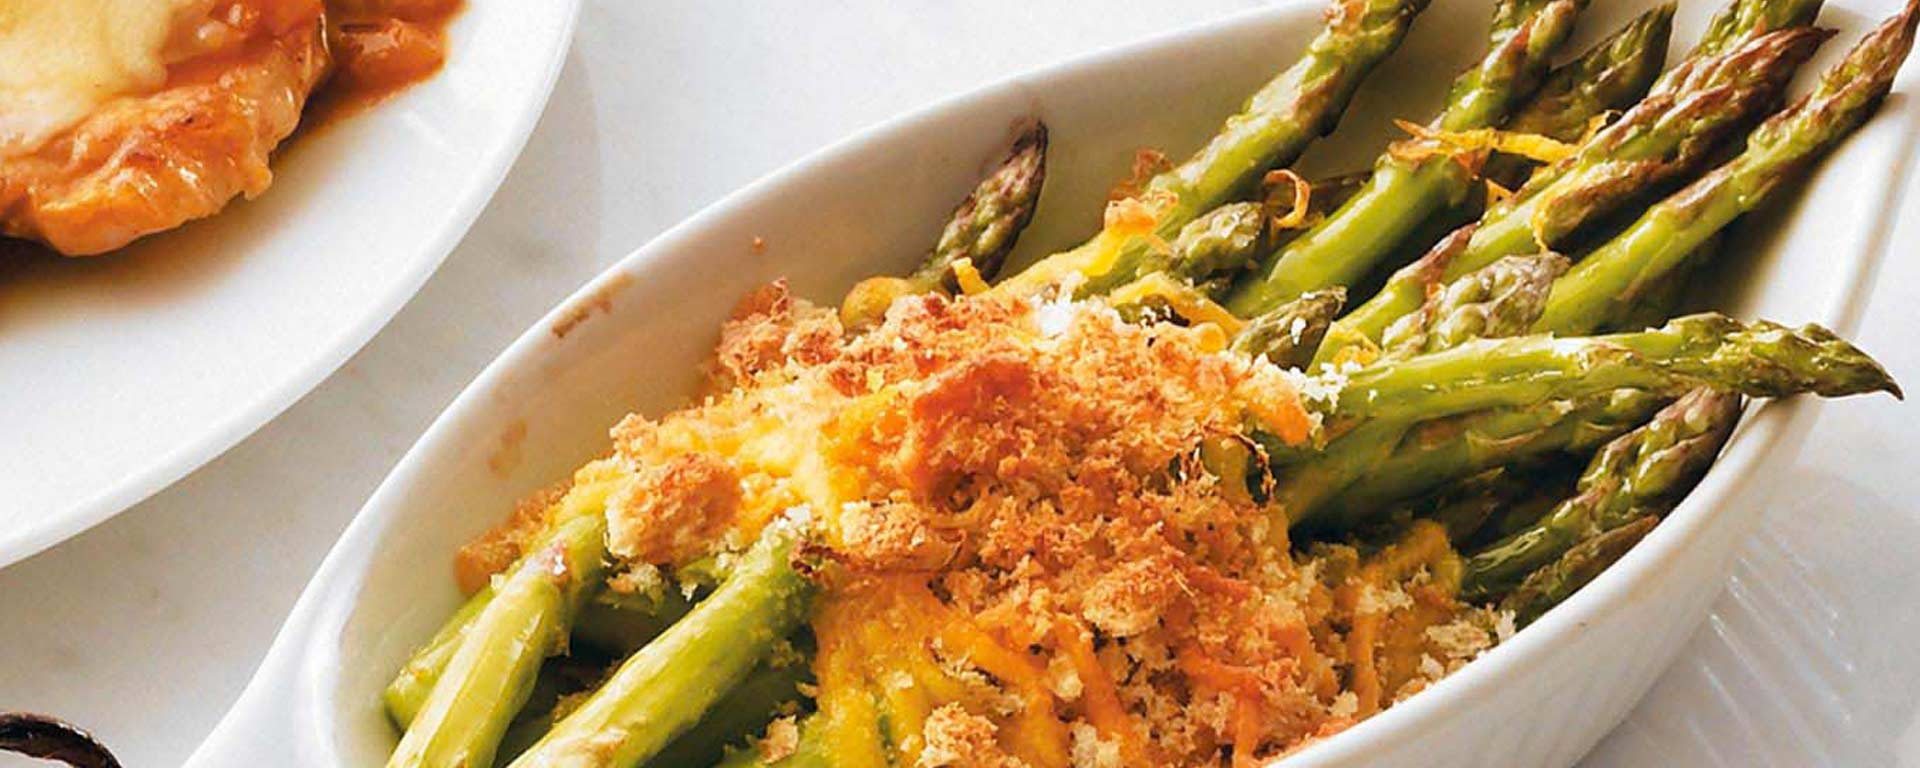 Photo for - Lemon-Roasted Asparagus Gratin